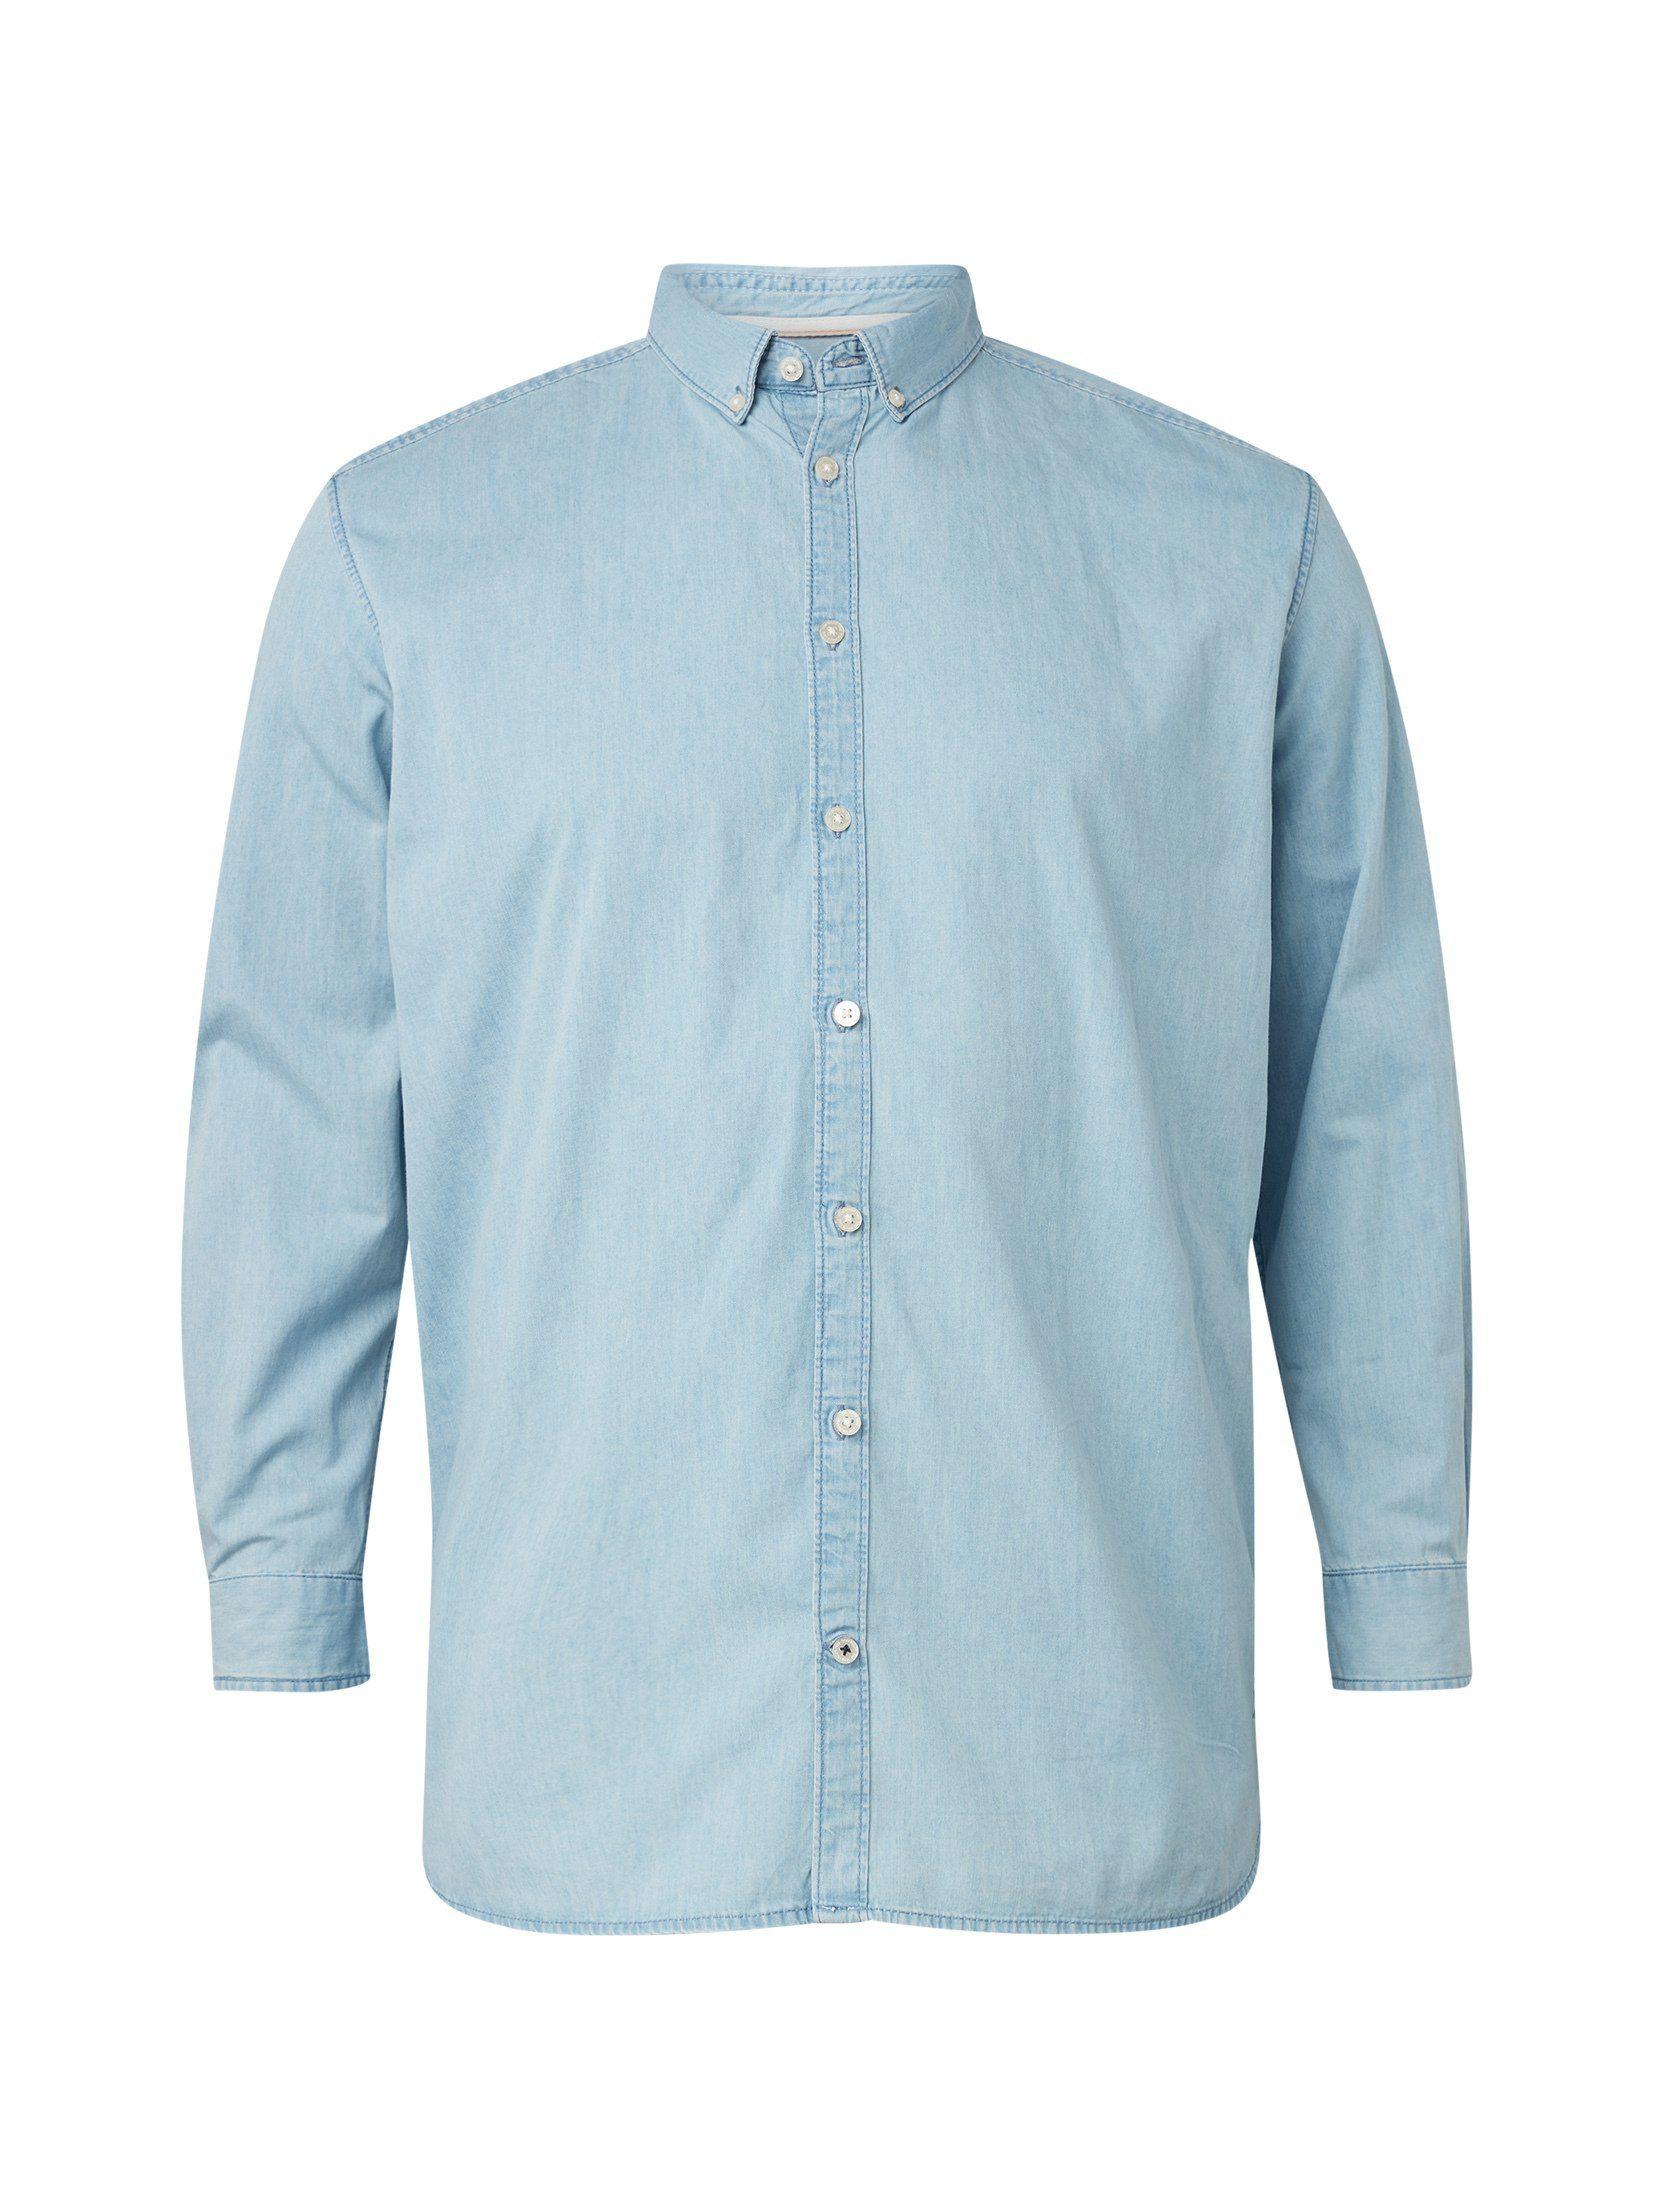 40-48 Guido Maria Kretschmer by Heine Bluse Shirt chiffon Gr 225